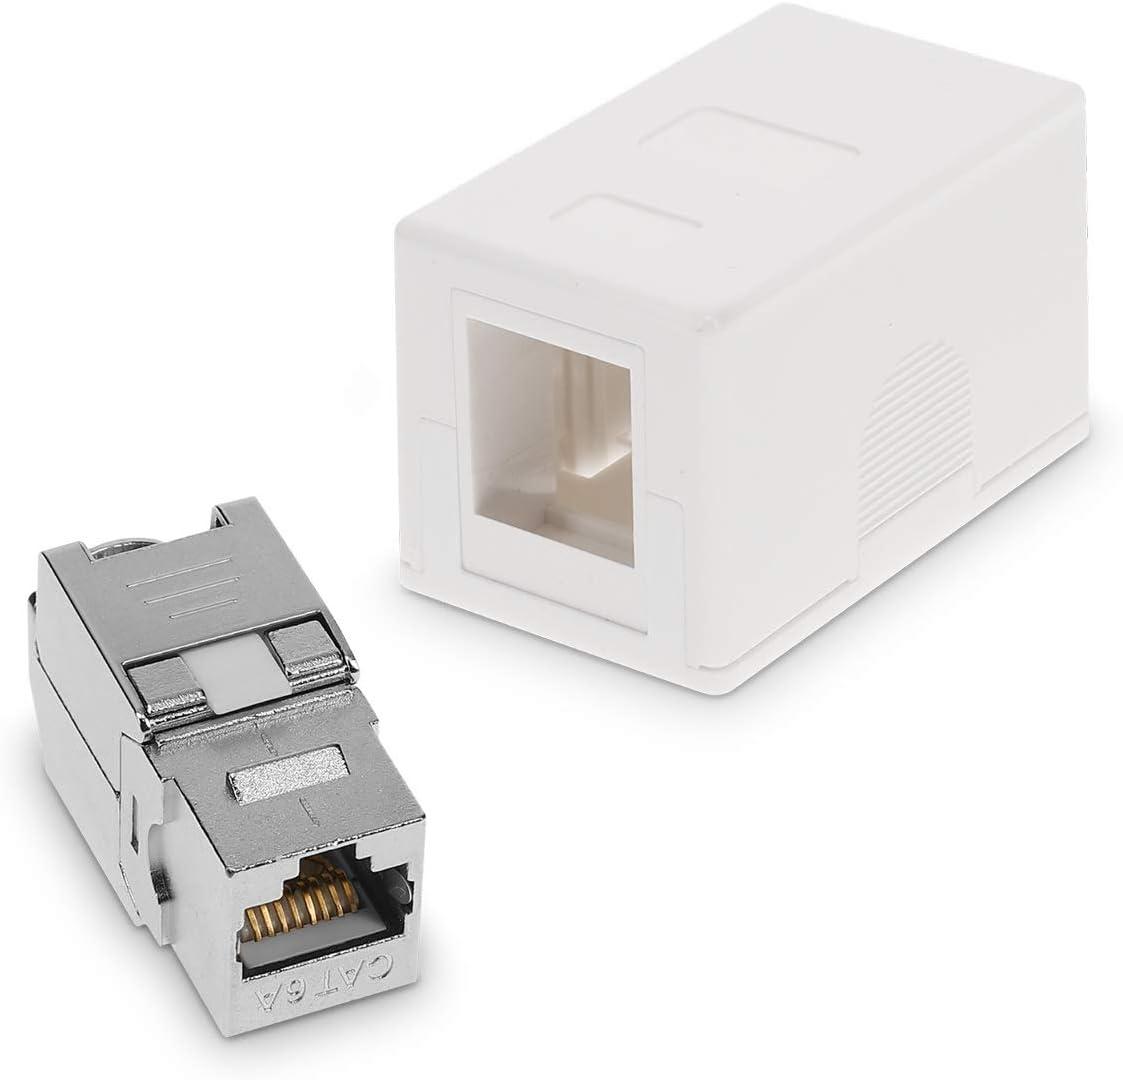 Kwmobile 1x Cat 6a Surface Mounted Network Socket Including 1x Keystone Module 1 Port Rj45 Socket 10 Gbit S Network Lan Wall Socket Internet Socket Set In White White 50453 02 01 M000142 Baumarkt